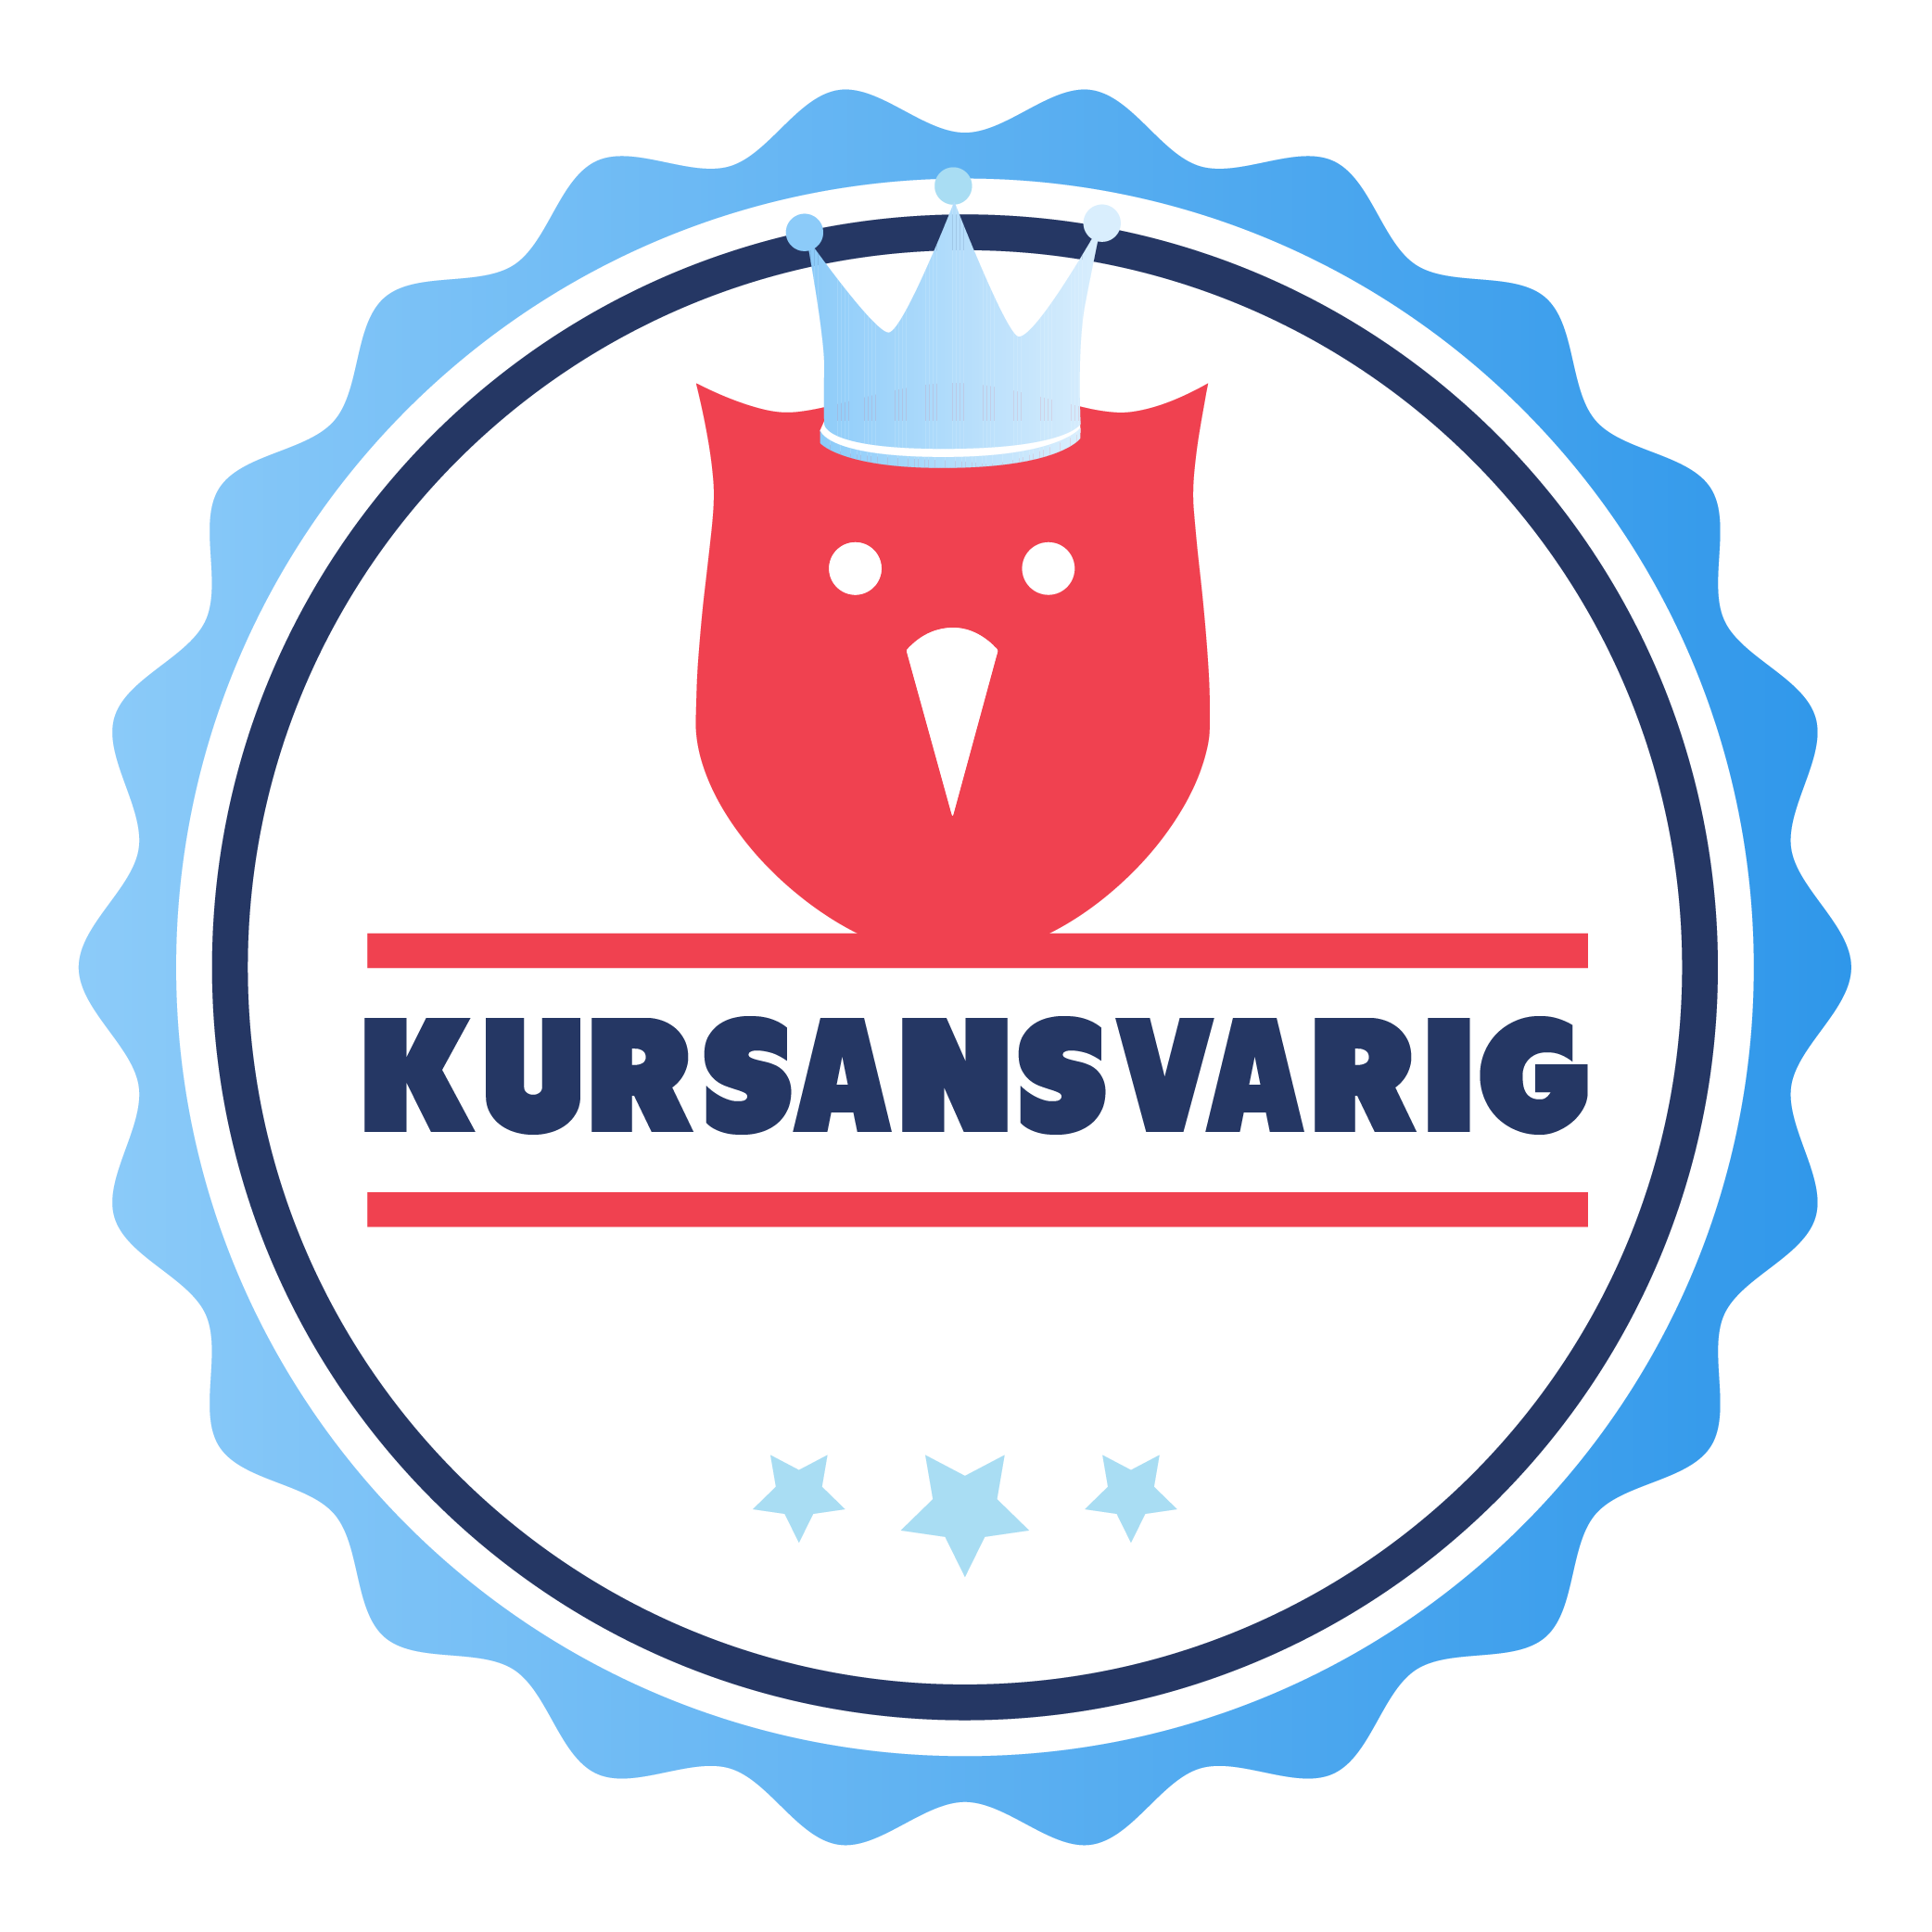 Kursansvarig